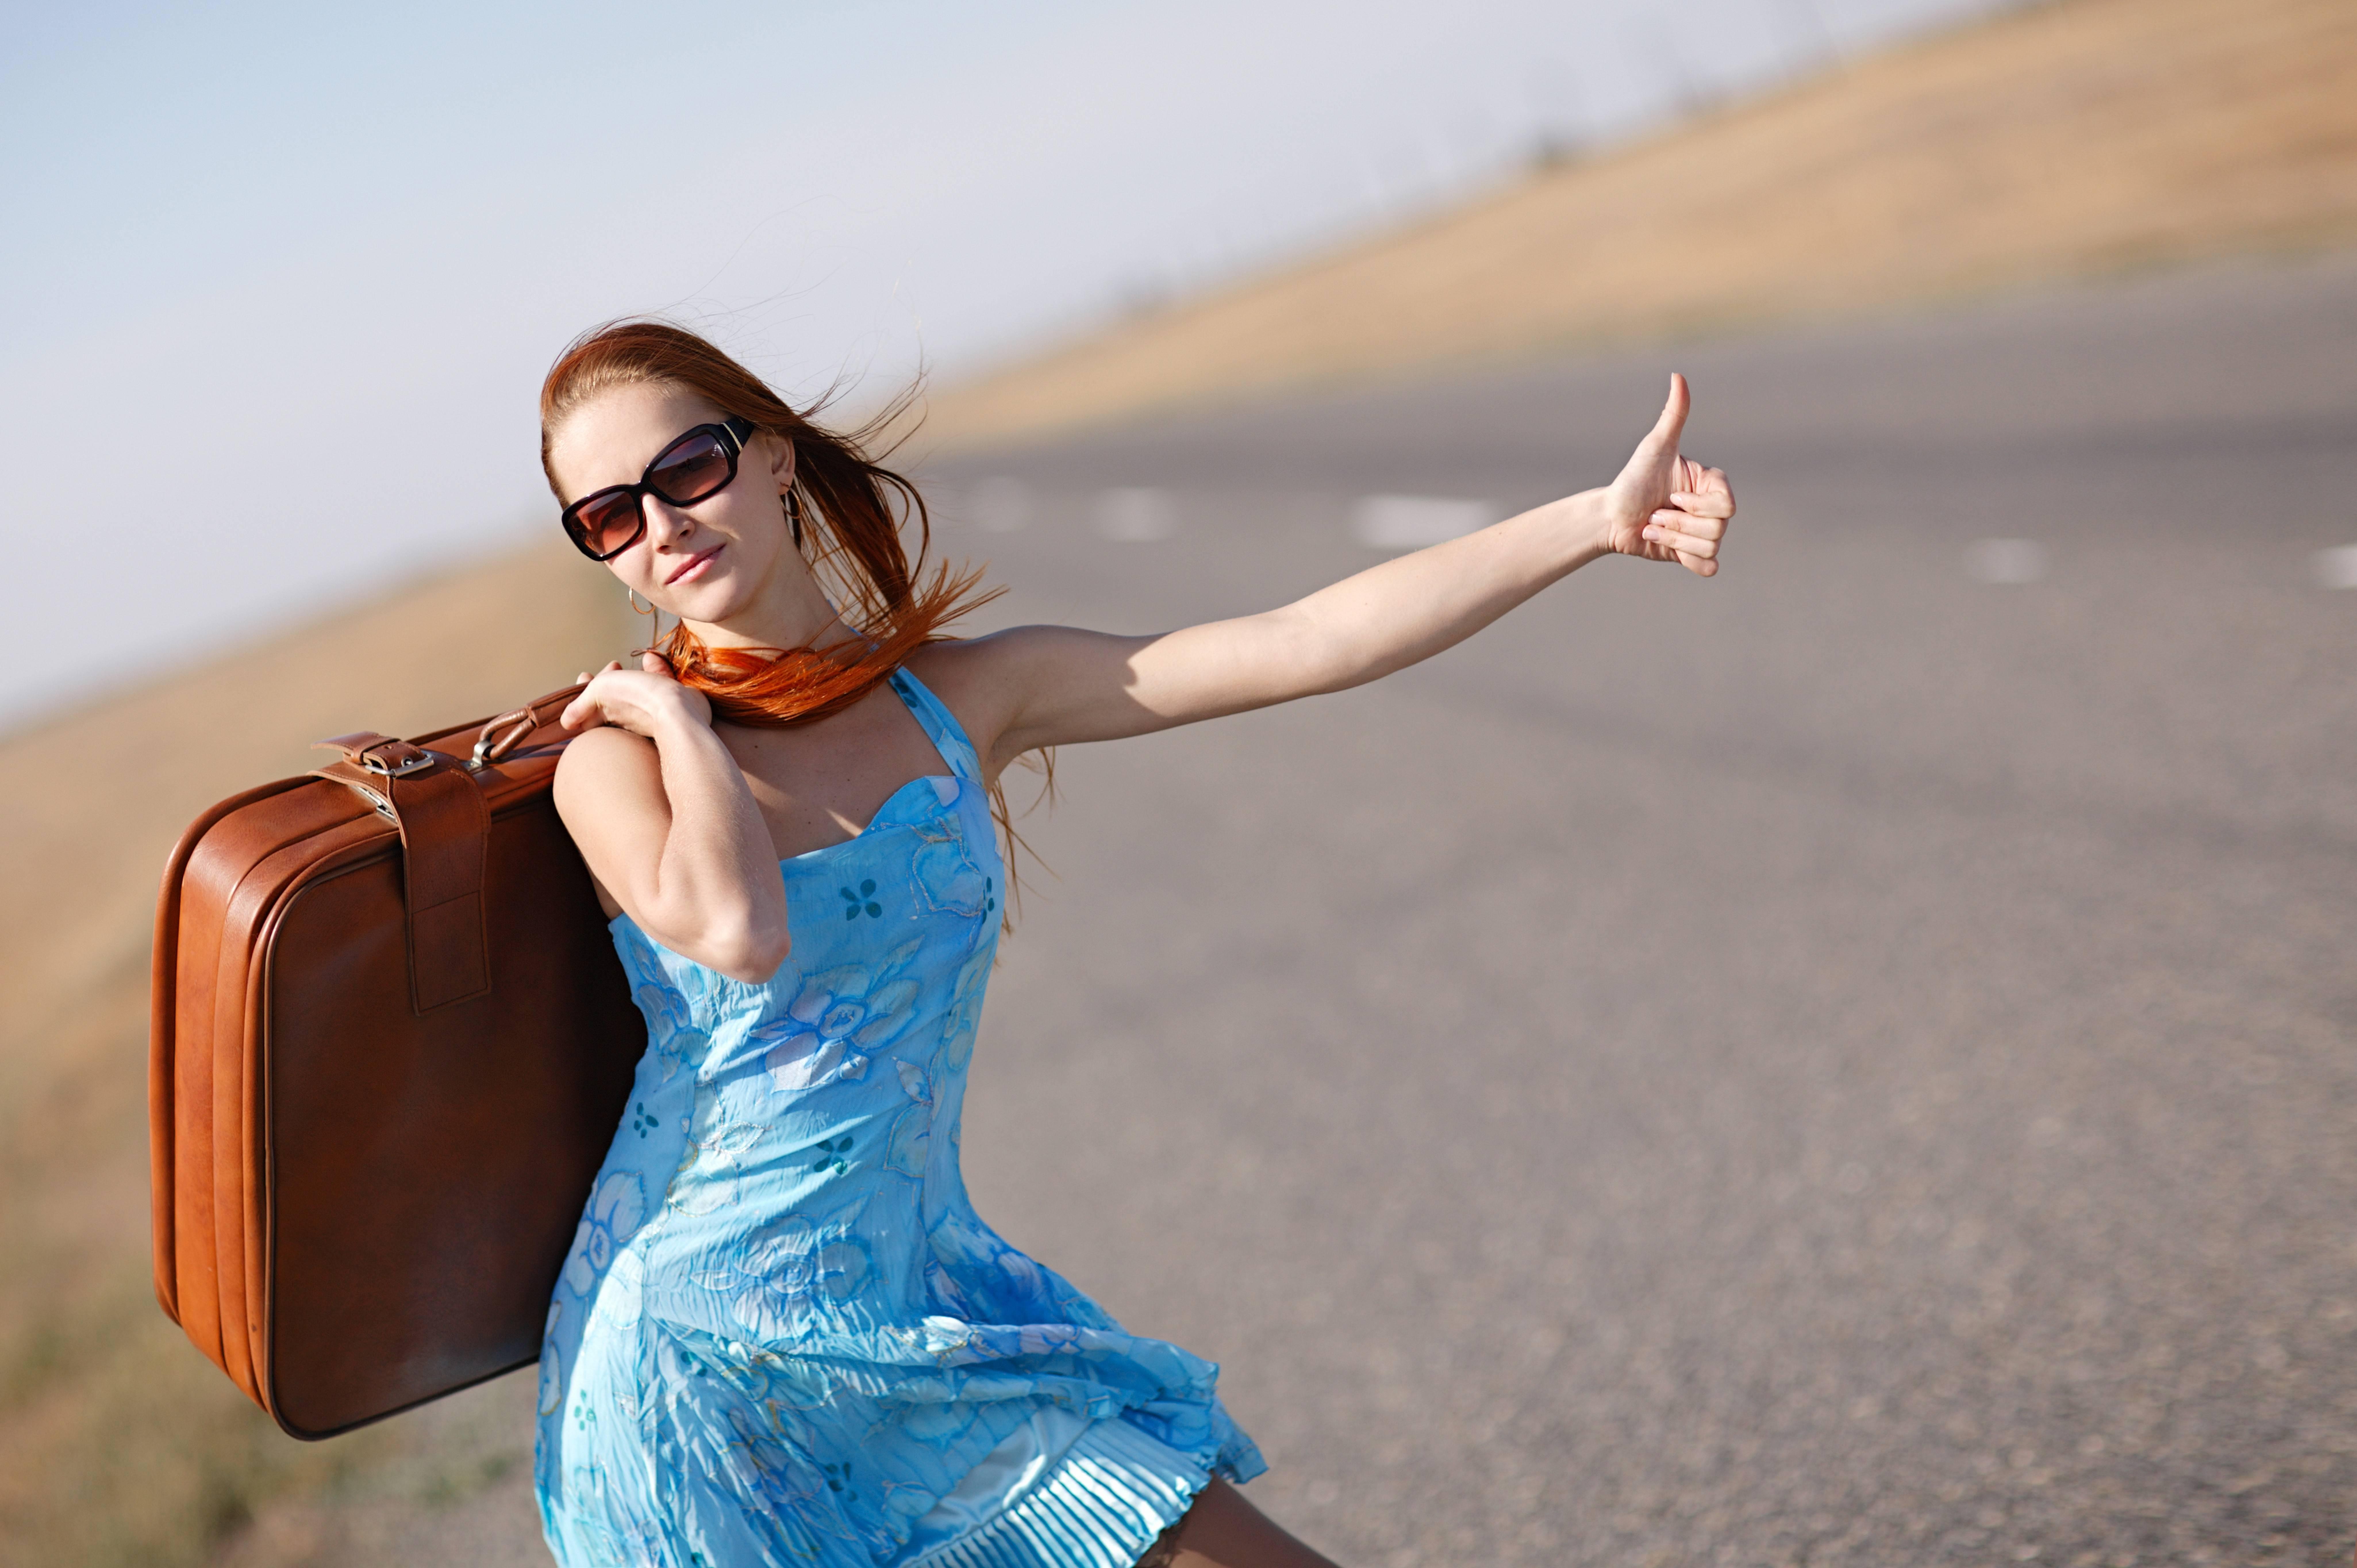 обои девушка, красотка, модель, автостоп картинки фото